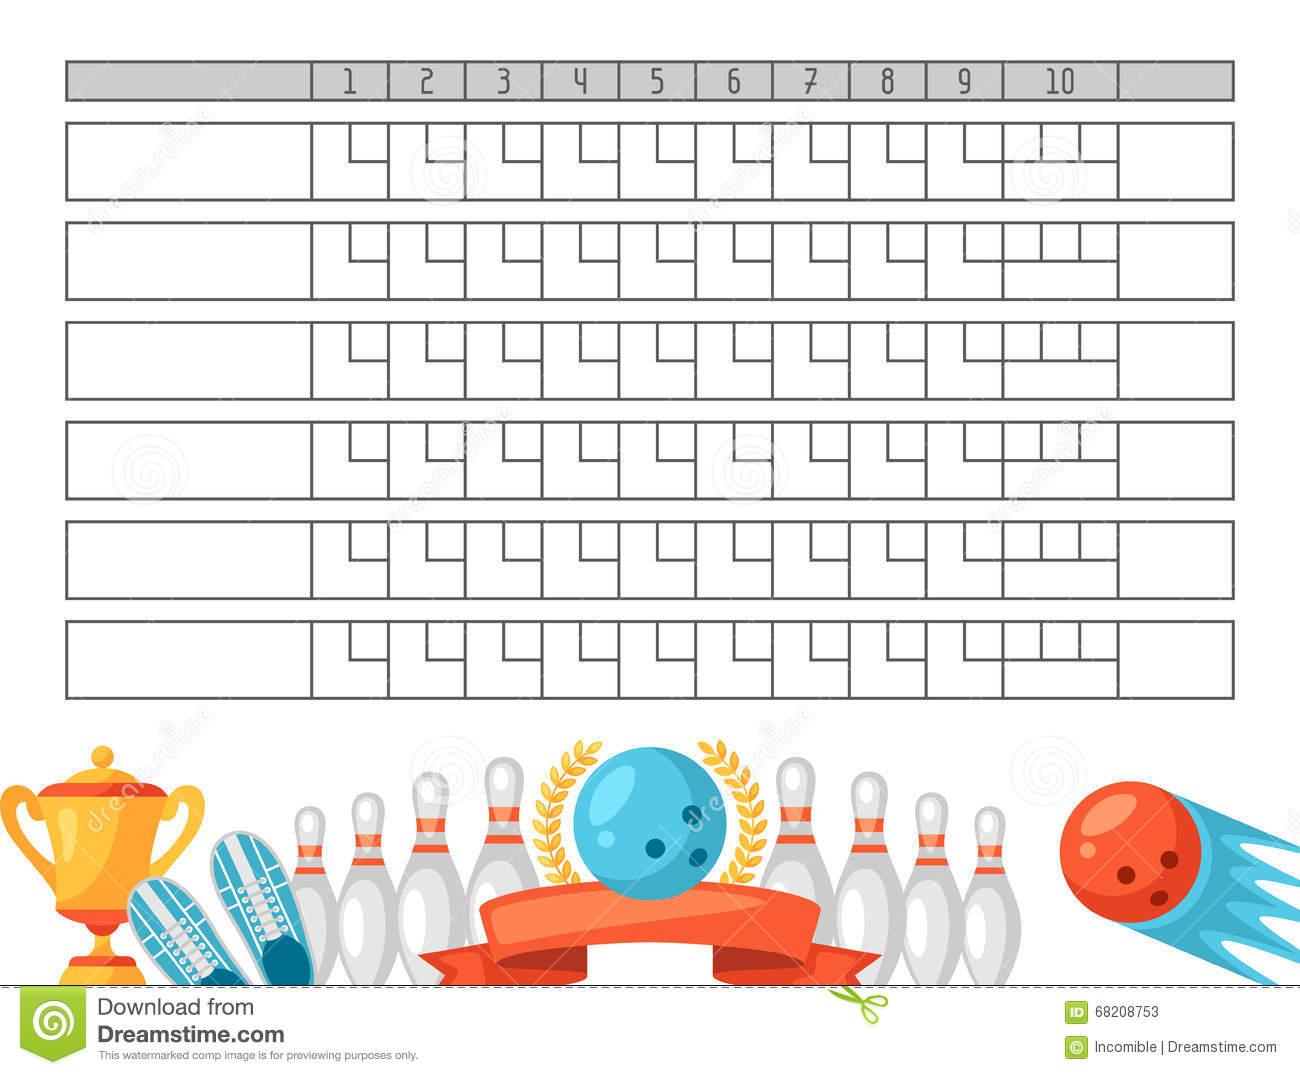 Template: Free Printables Bowling Score Sheet. Bowling Score Sheet - Free Printable Bowling Score Sheets